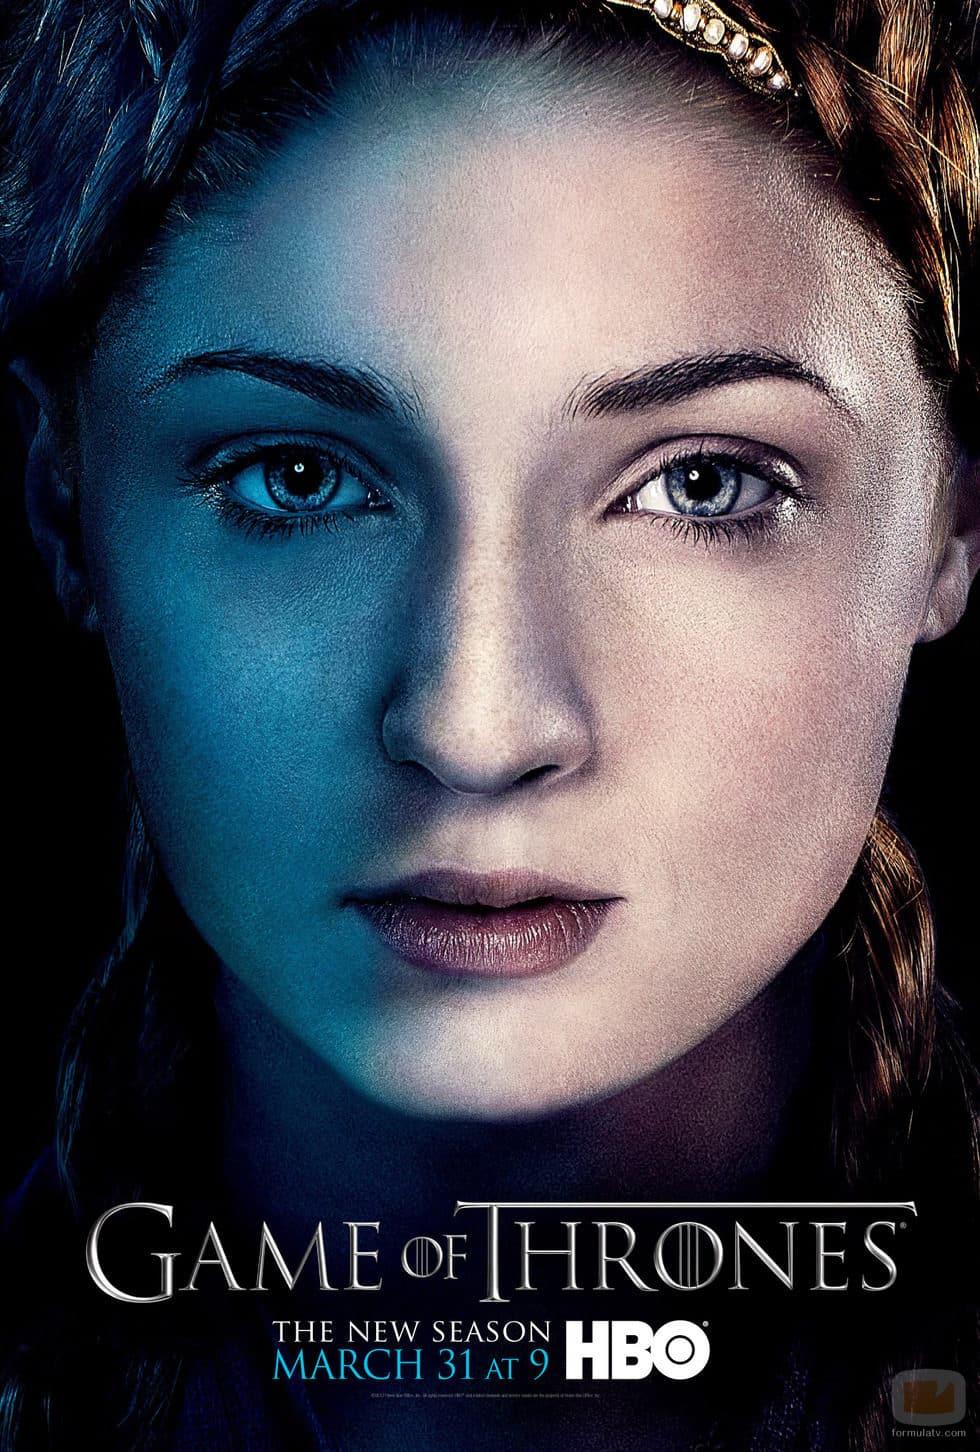 sansa-stark-poster-promocional-tercera-temporada-juego-de-tronos